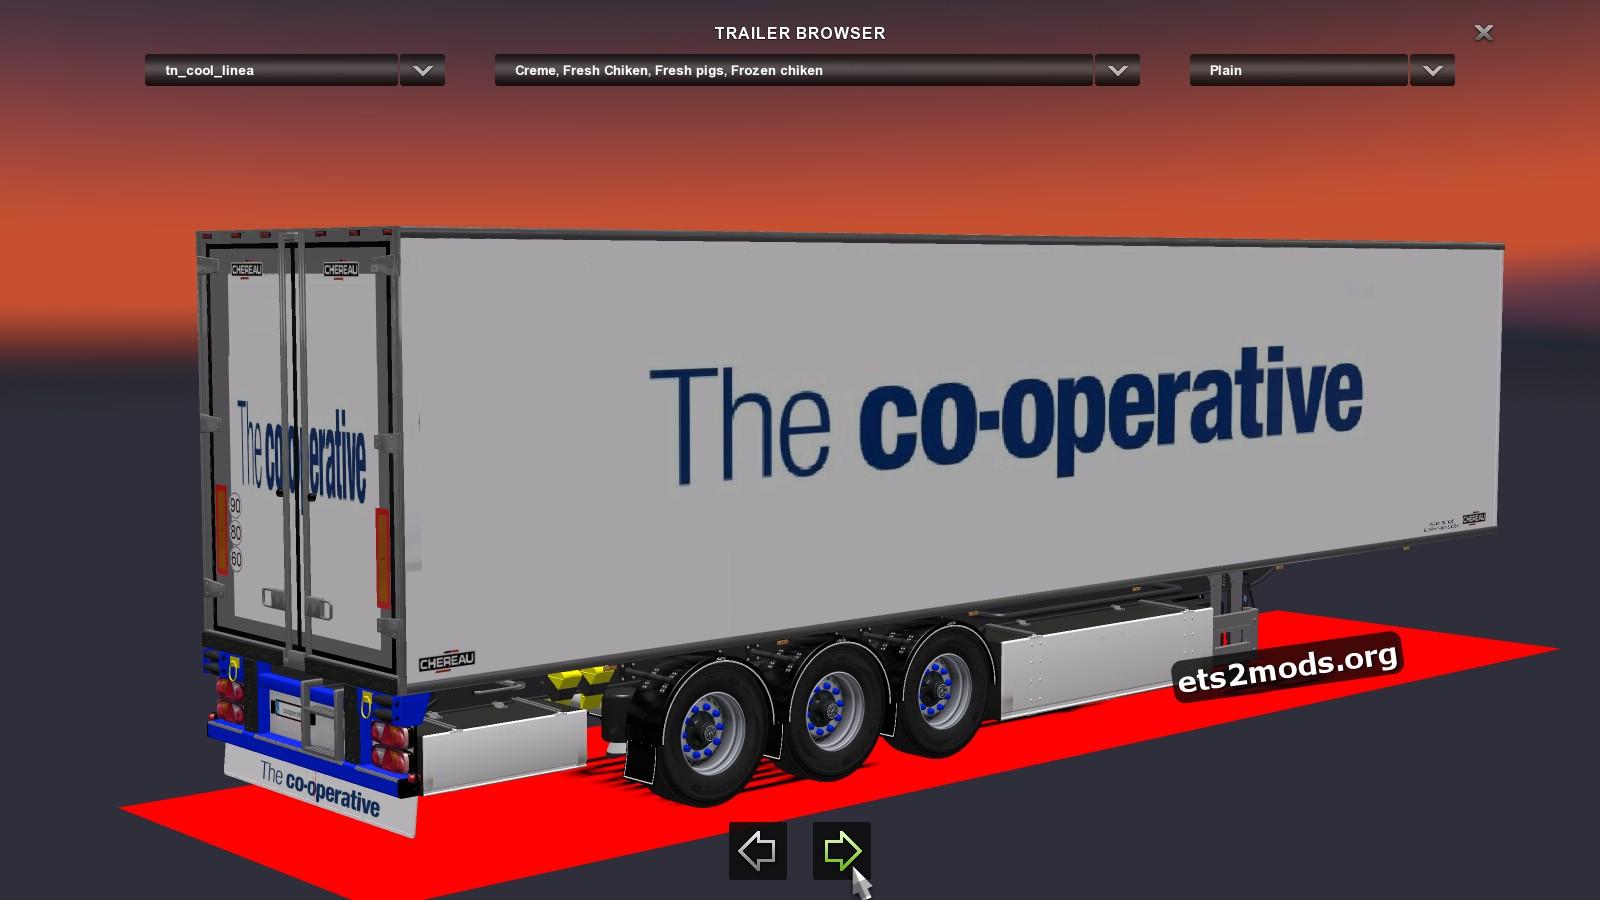 Trailer - Cooperative